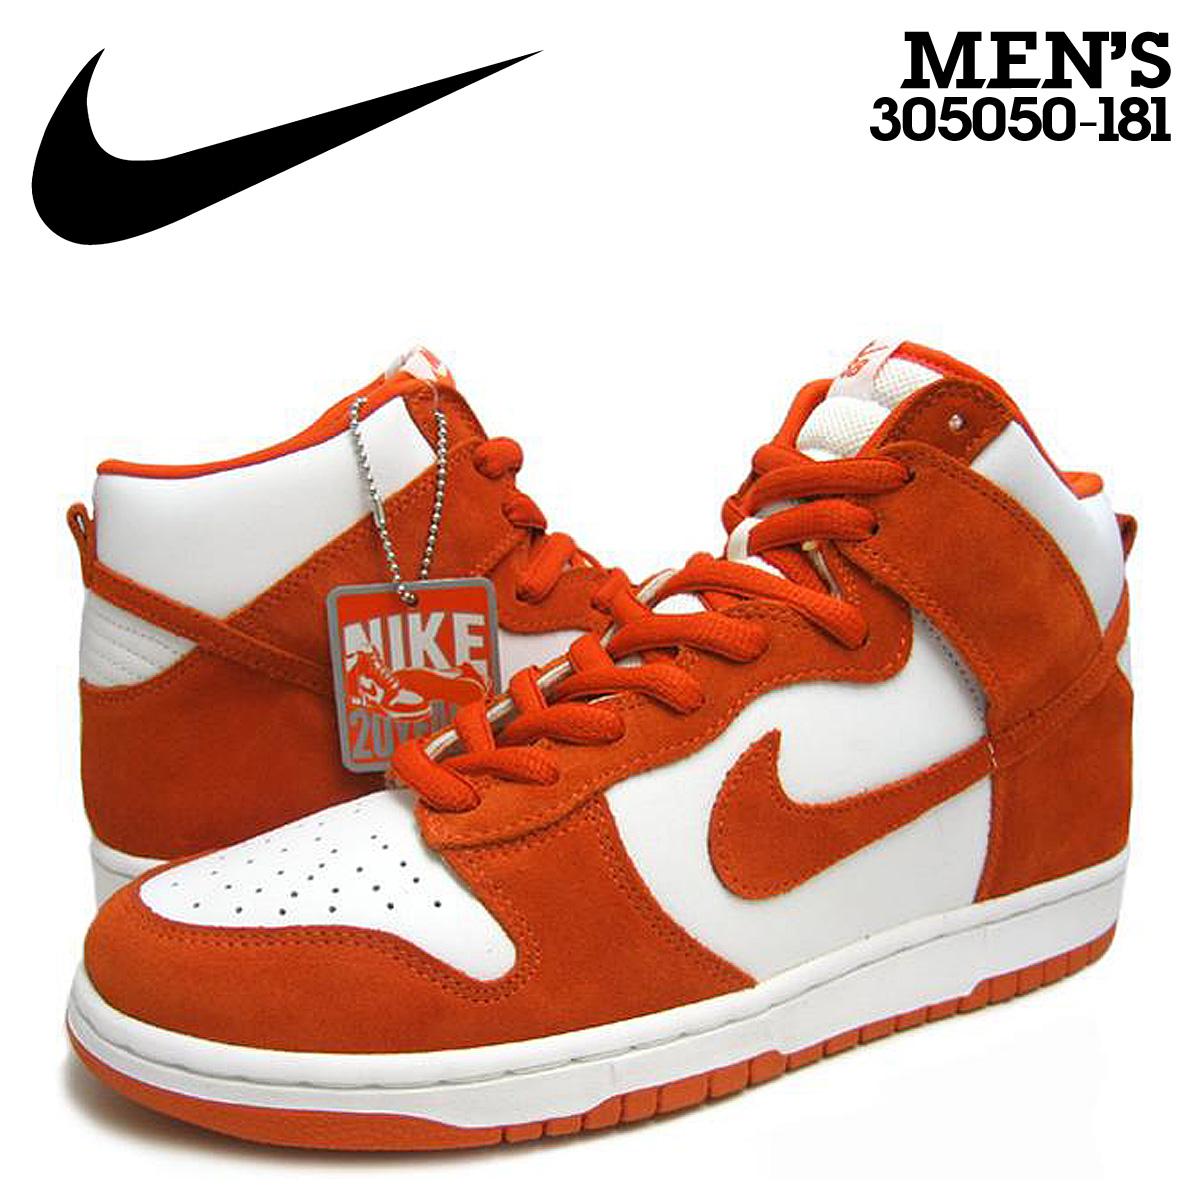 superior quality 53461 311cf Nike NIKE dunk sneakers DUNK HIGH PRO SB TRUE TO YOUR SCHOOL Dunk high Pro  SB 20th anniversary commemorative 305050-181 White Orange mens